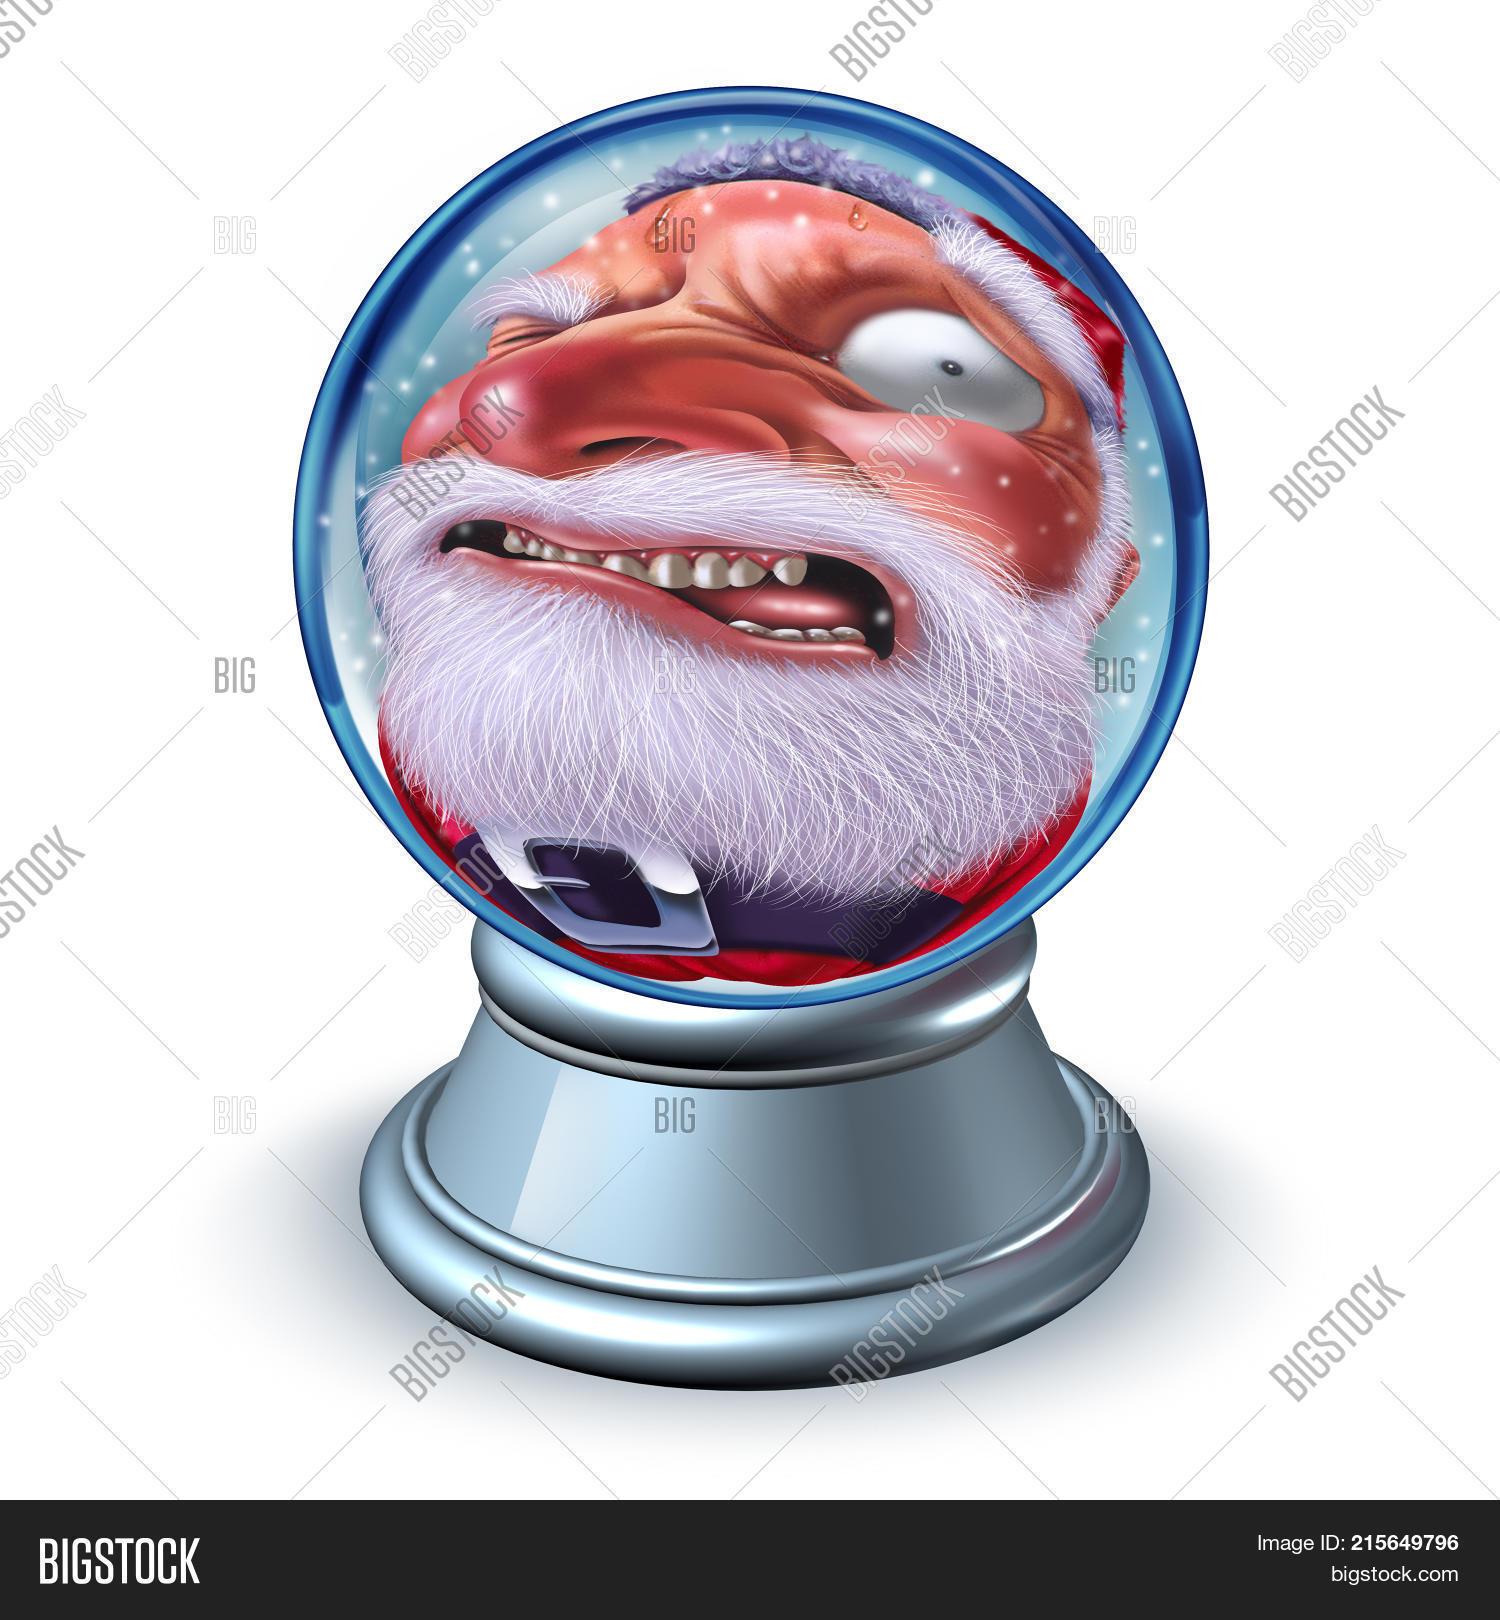 funny santa santaclaus snow globe image & photo | bigstock